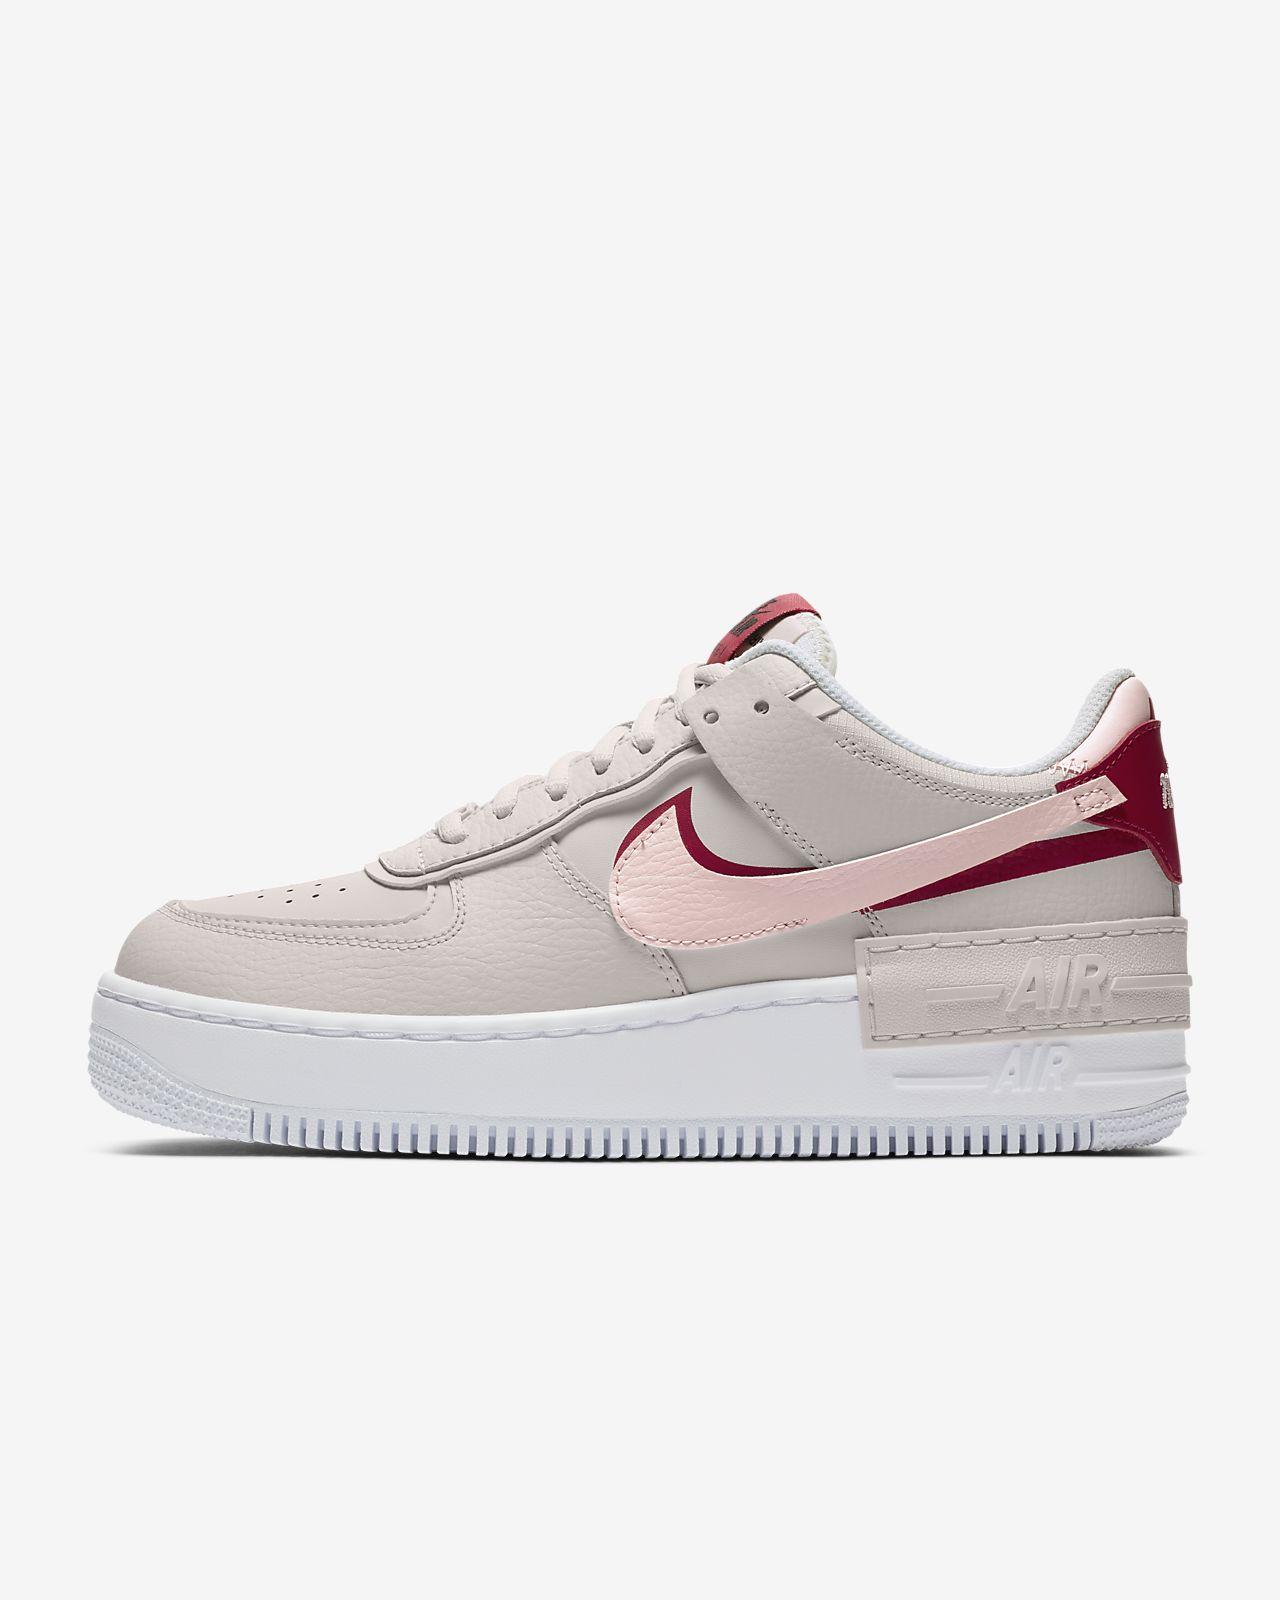 Nike Air Force 1 Low Womens Trainers White Pearl PinkWhite